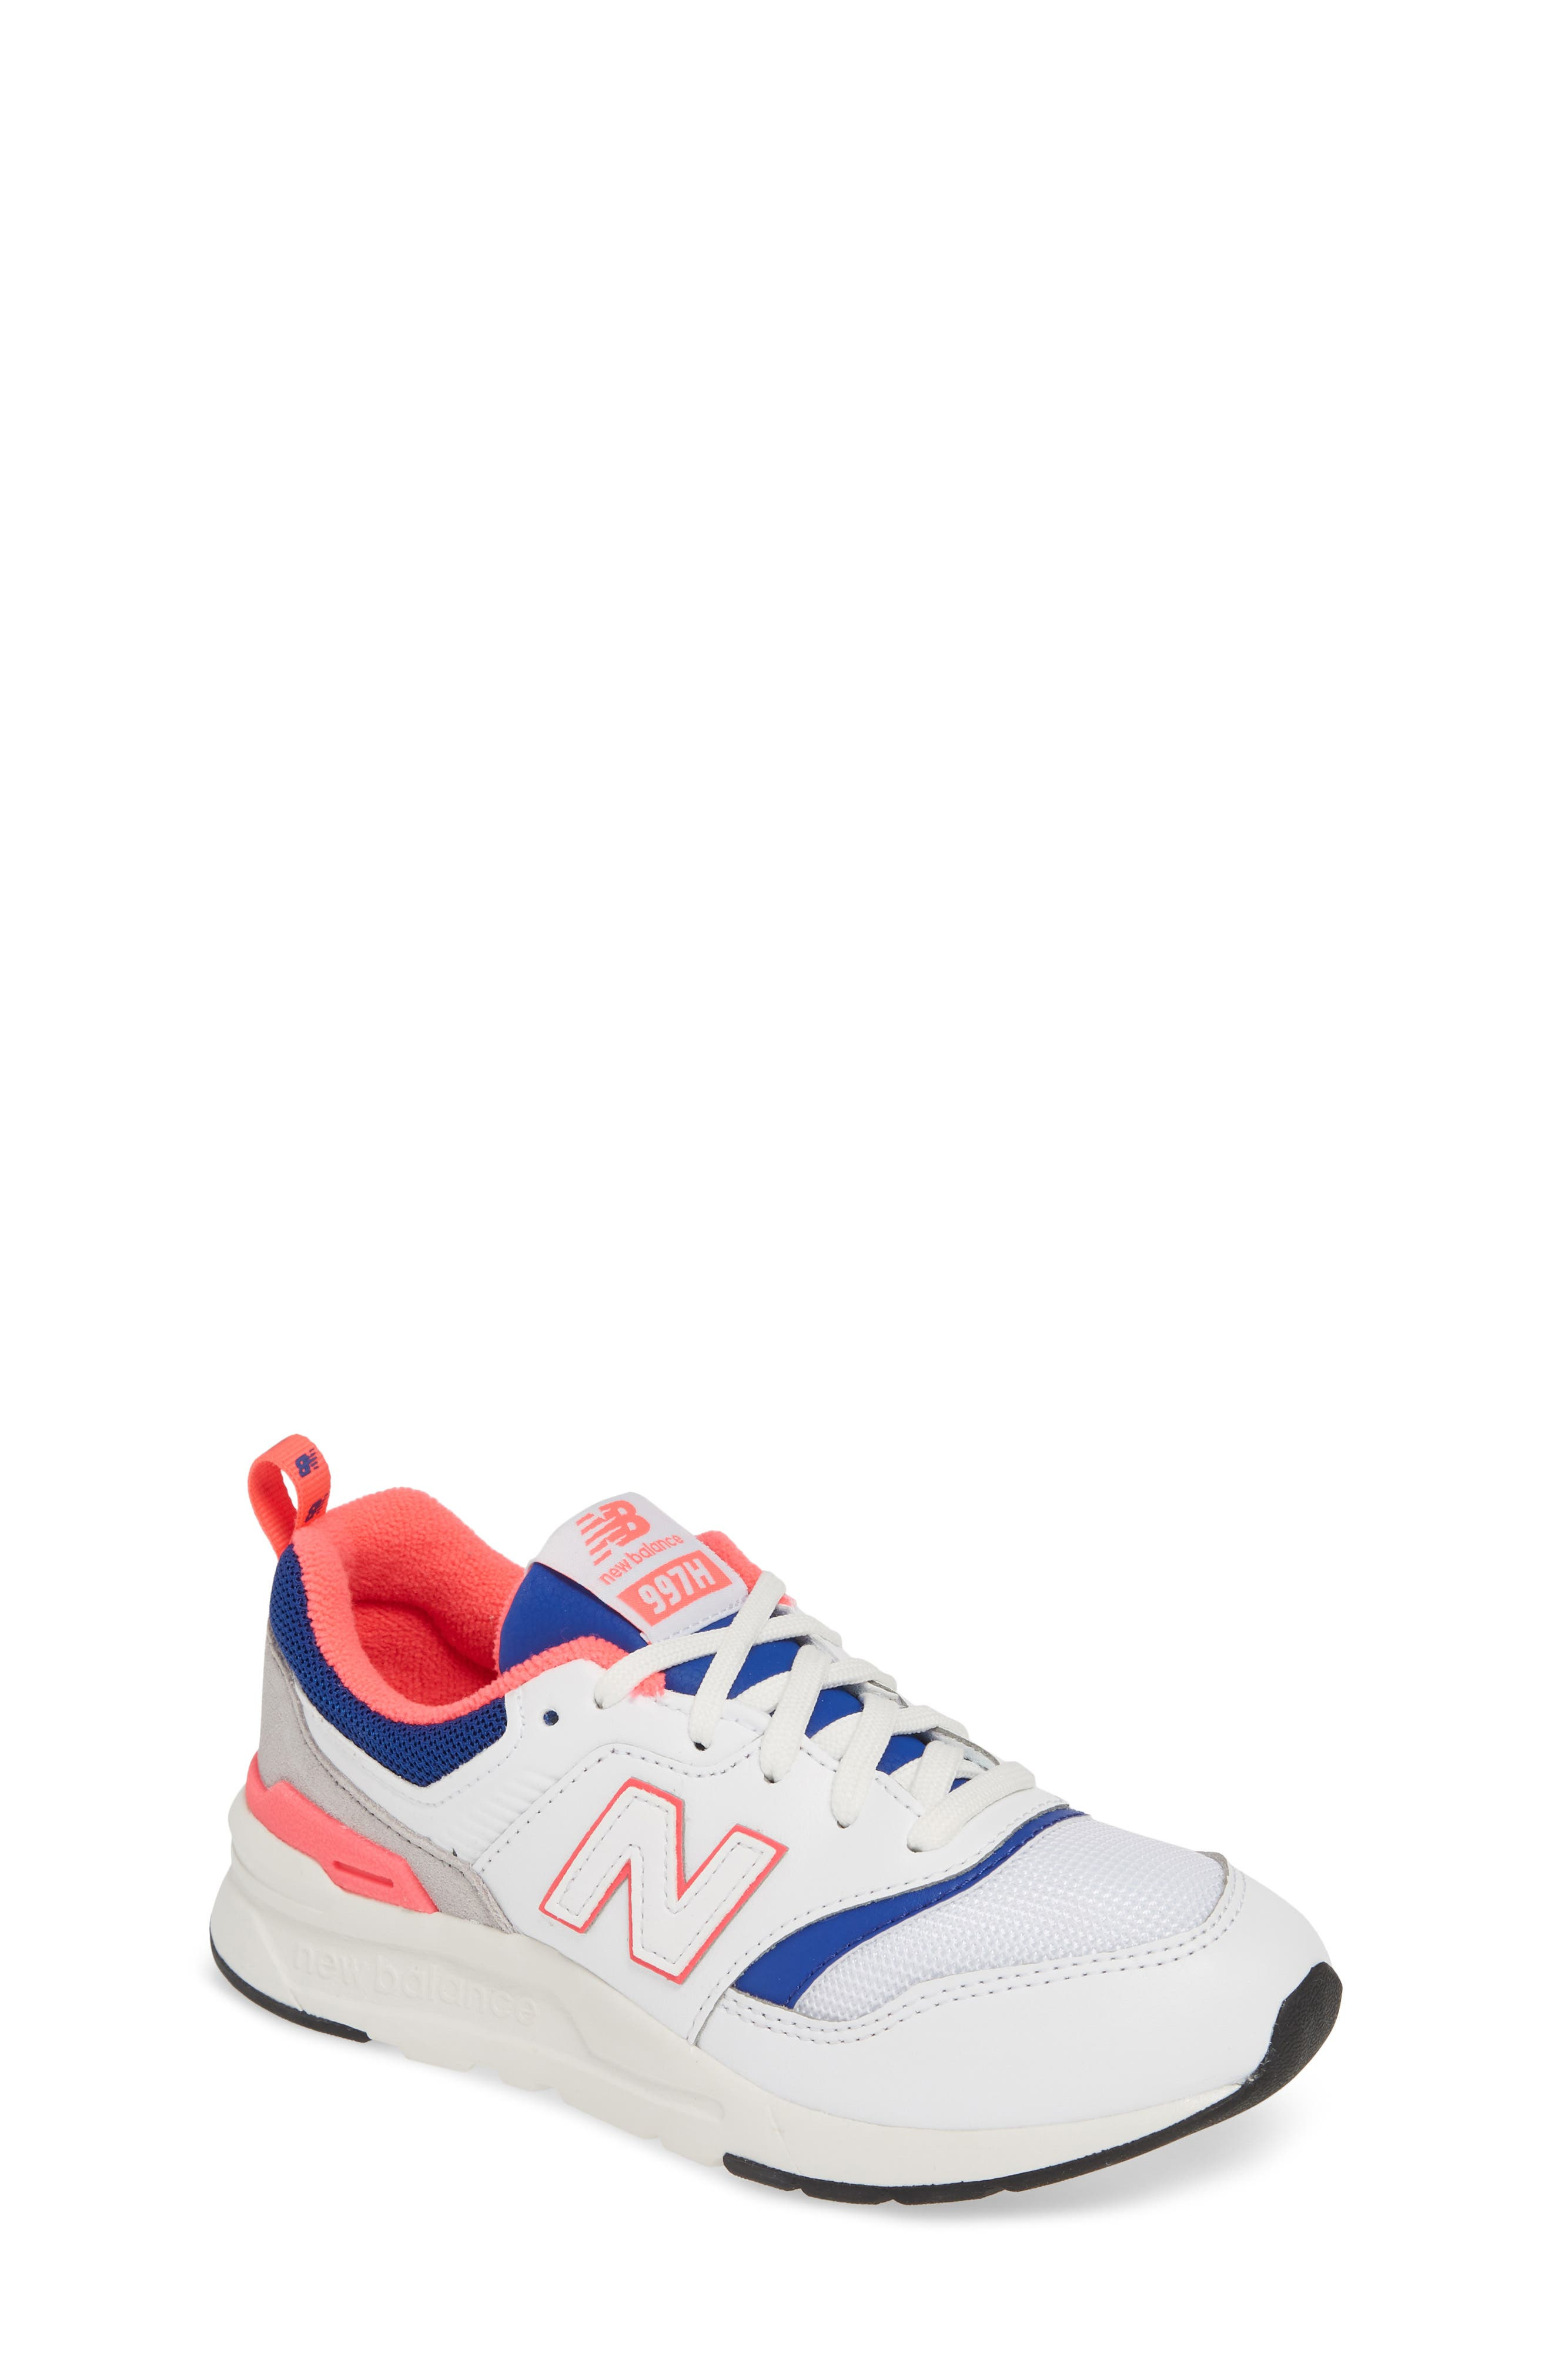 8f7d74d6af7dad White New Balance Running Shoes